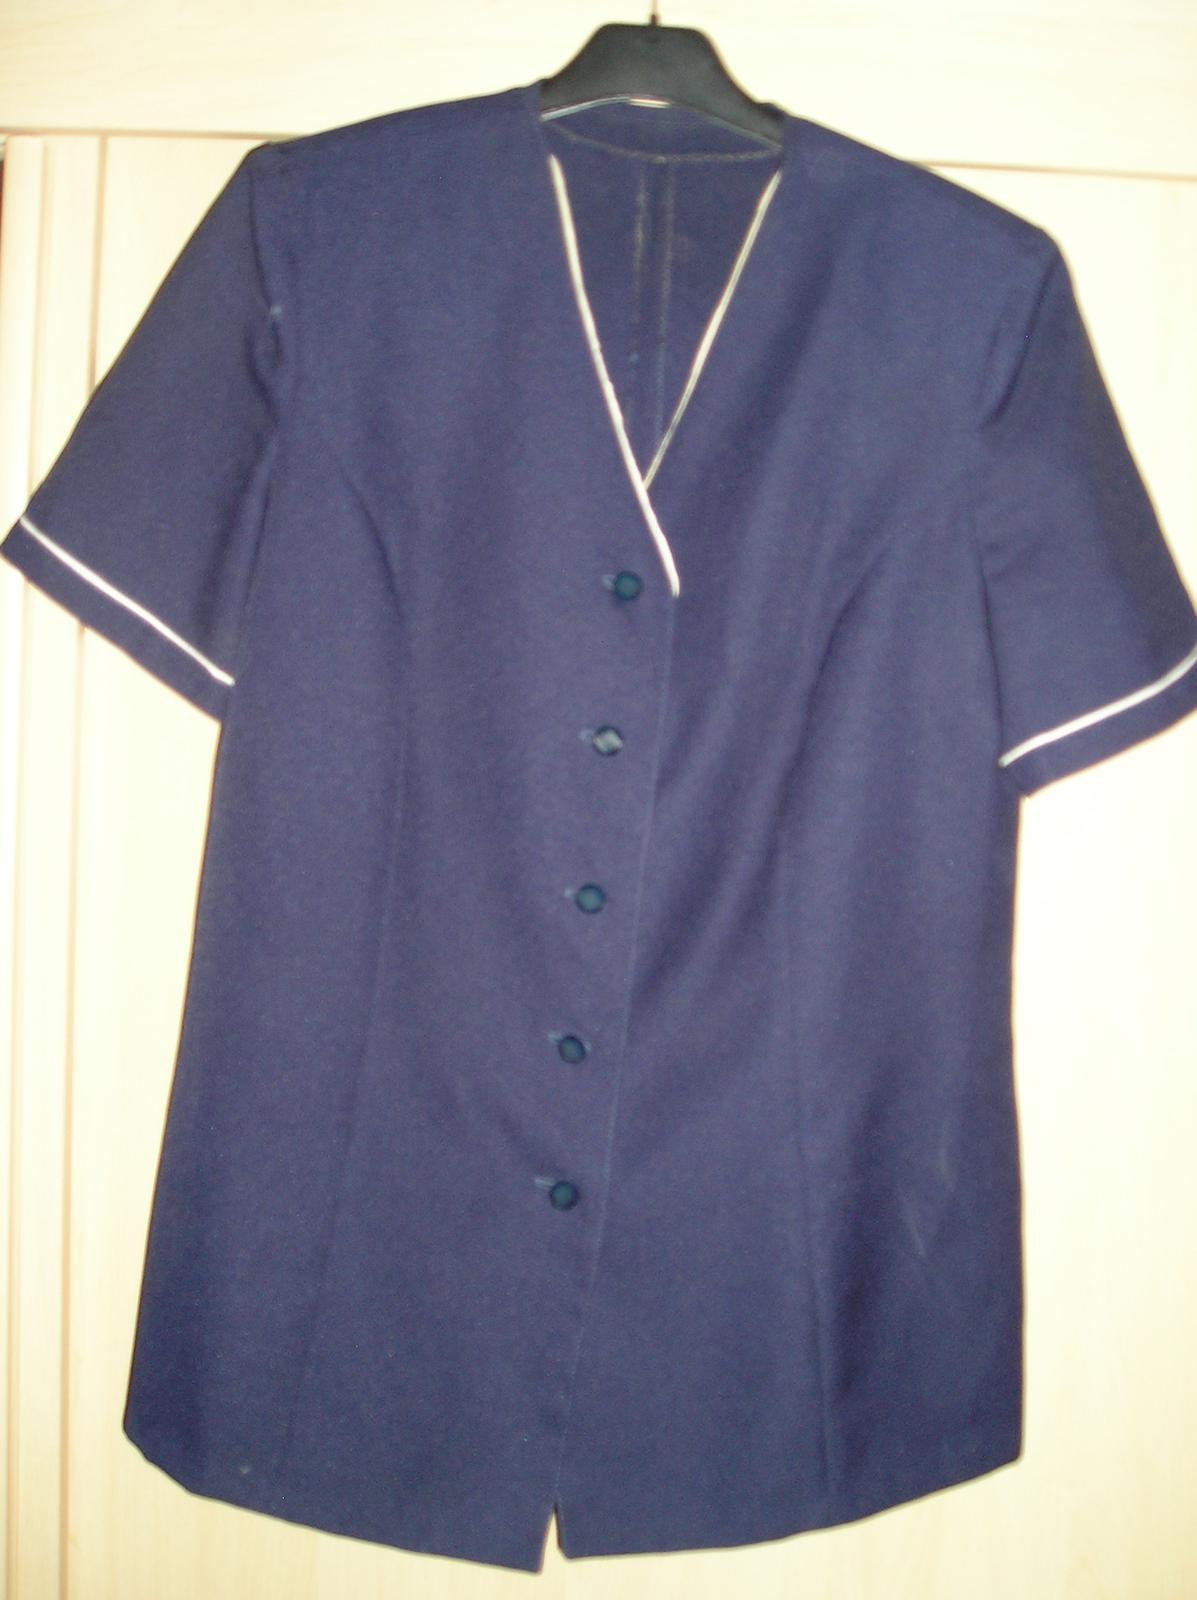 Elegantná tmavo-modrá blúzka s poštou - Obrázok č. 1